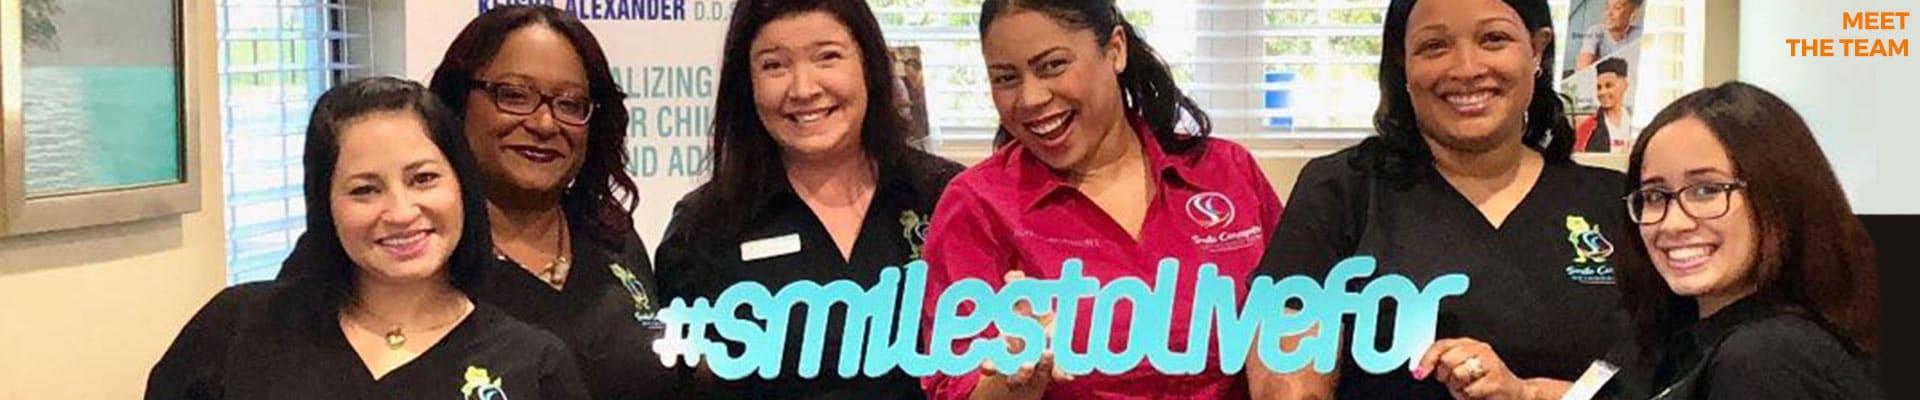 Meet the team Smile Concepts Orthodontics in Apopka, FL